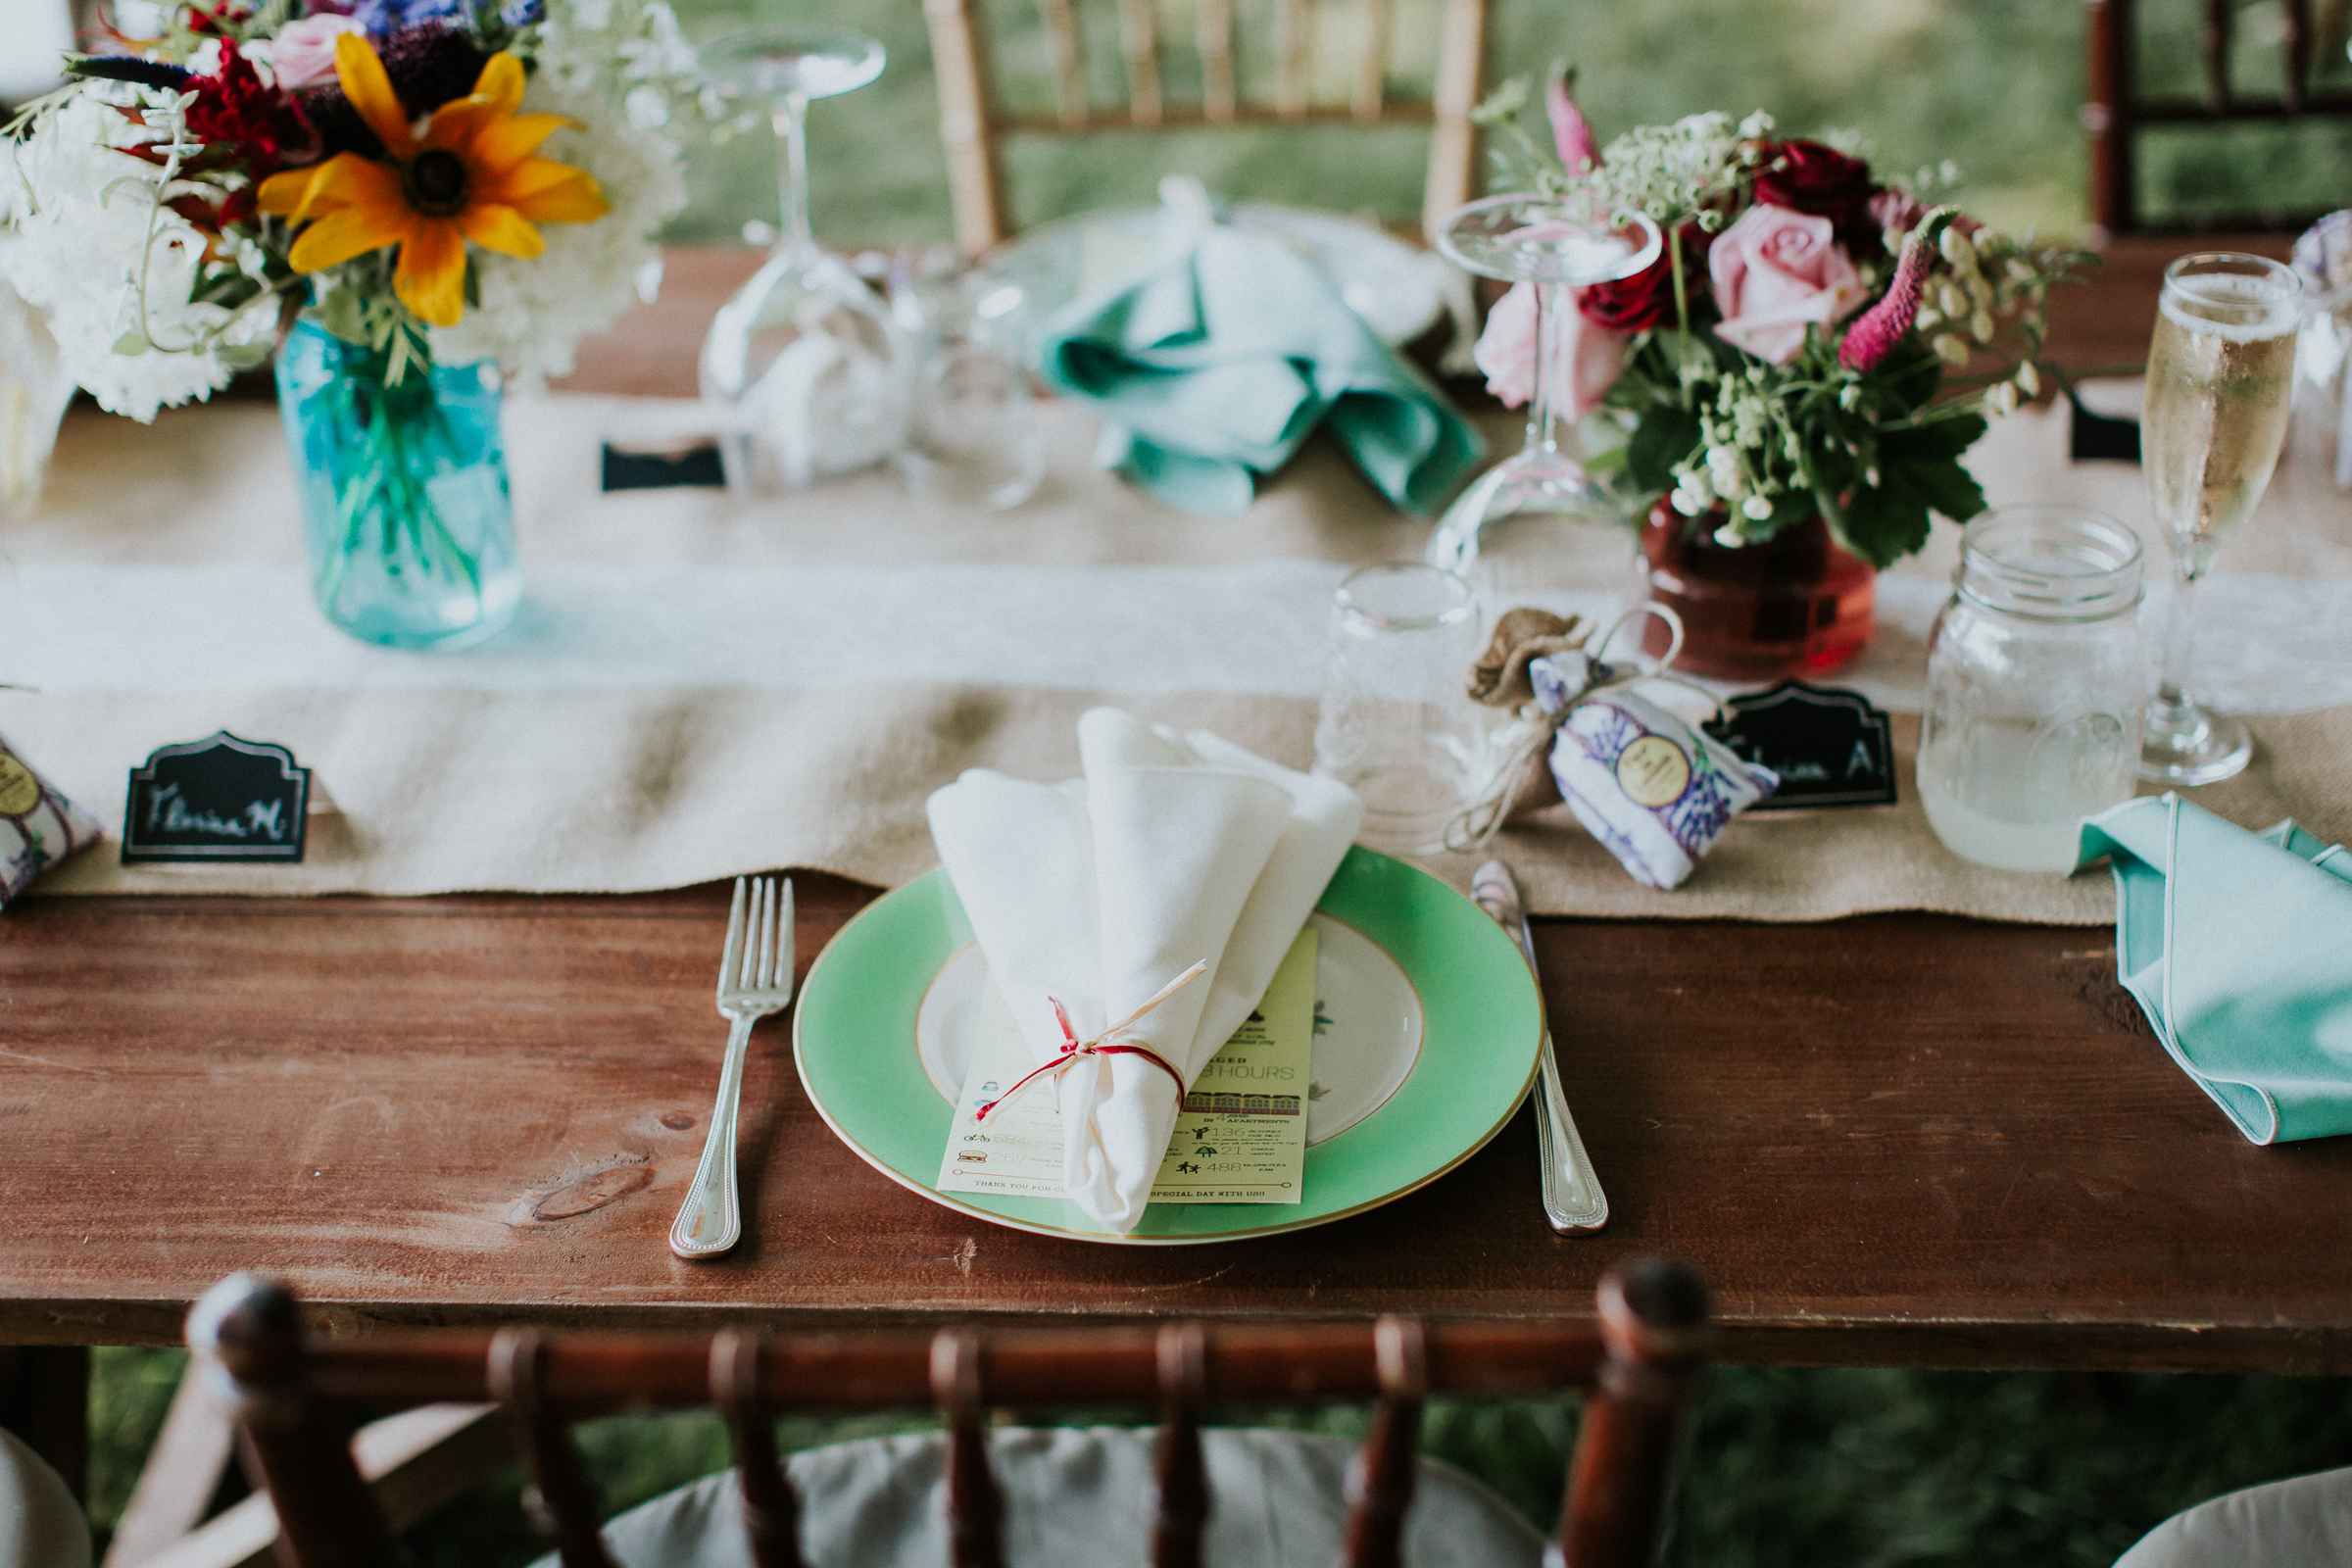 Backyard-Intimate-Adventurous-Destination-Wedding-Darien-Connecticut-Documentary-Wedding-Photography-103.jpg